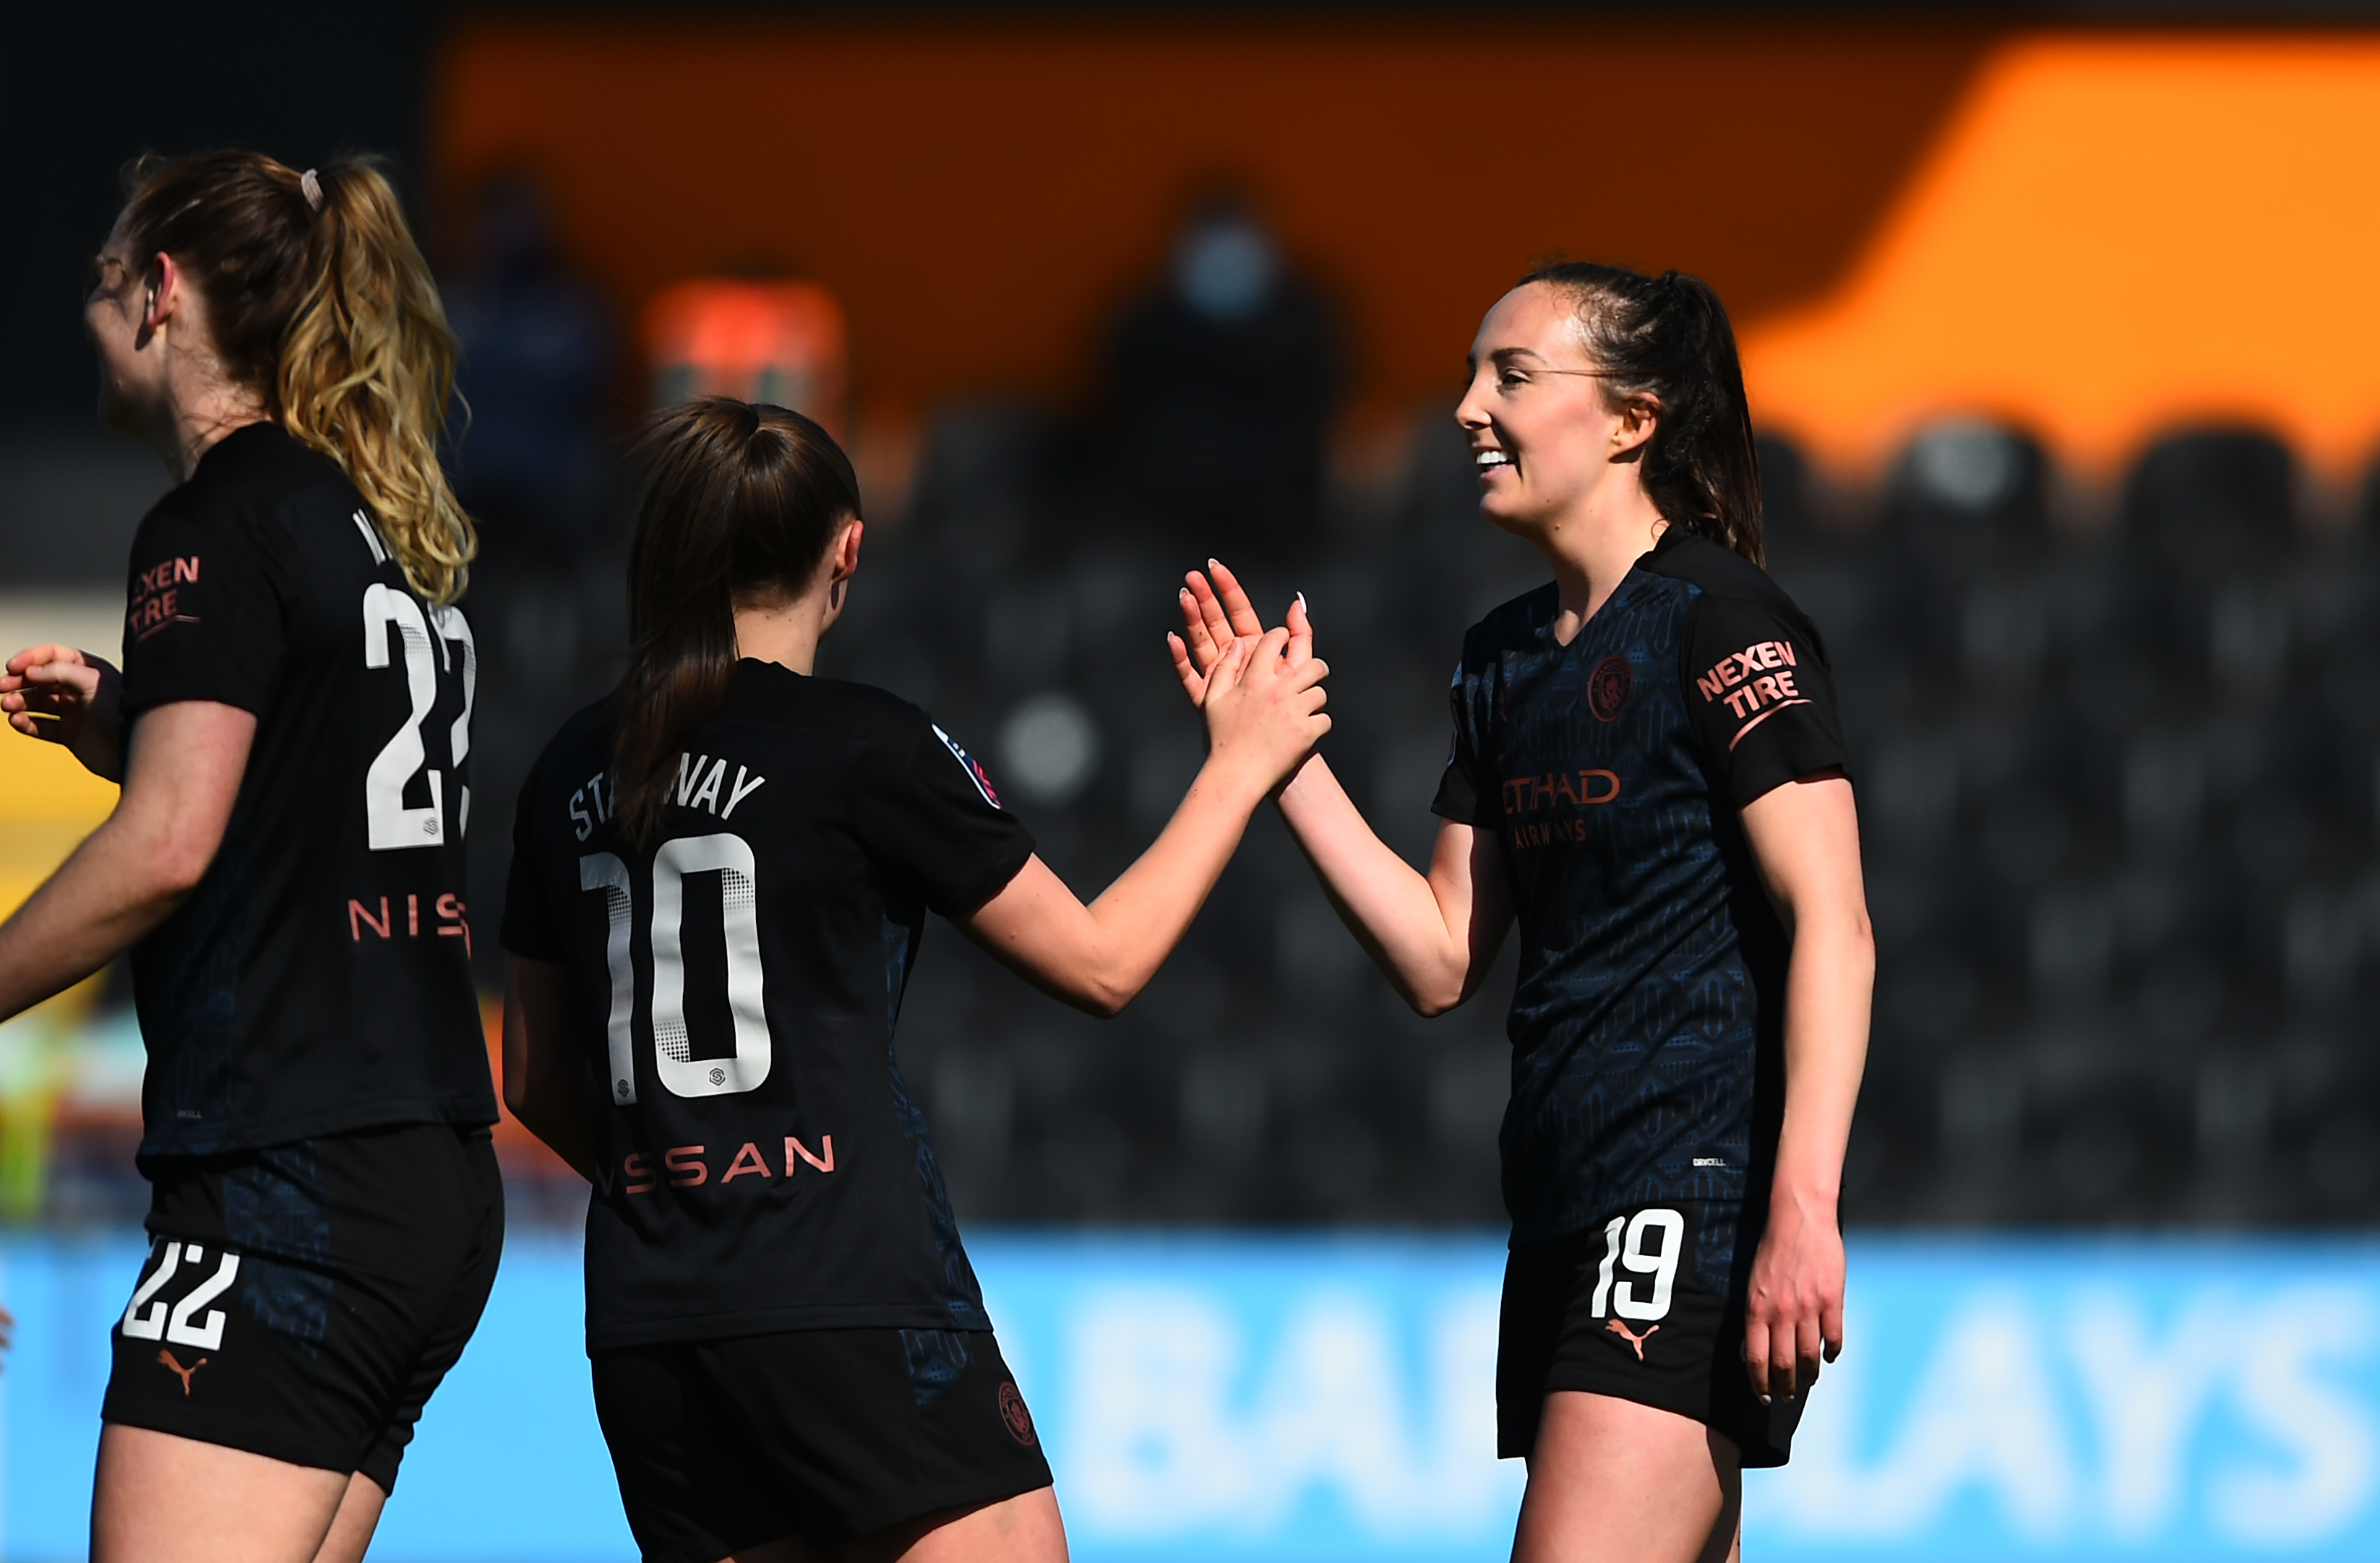 Tottenham Hotspur Women v Manchester City Women - Barclays FA Women's Super League